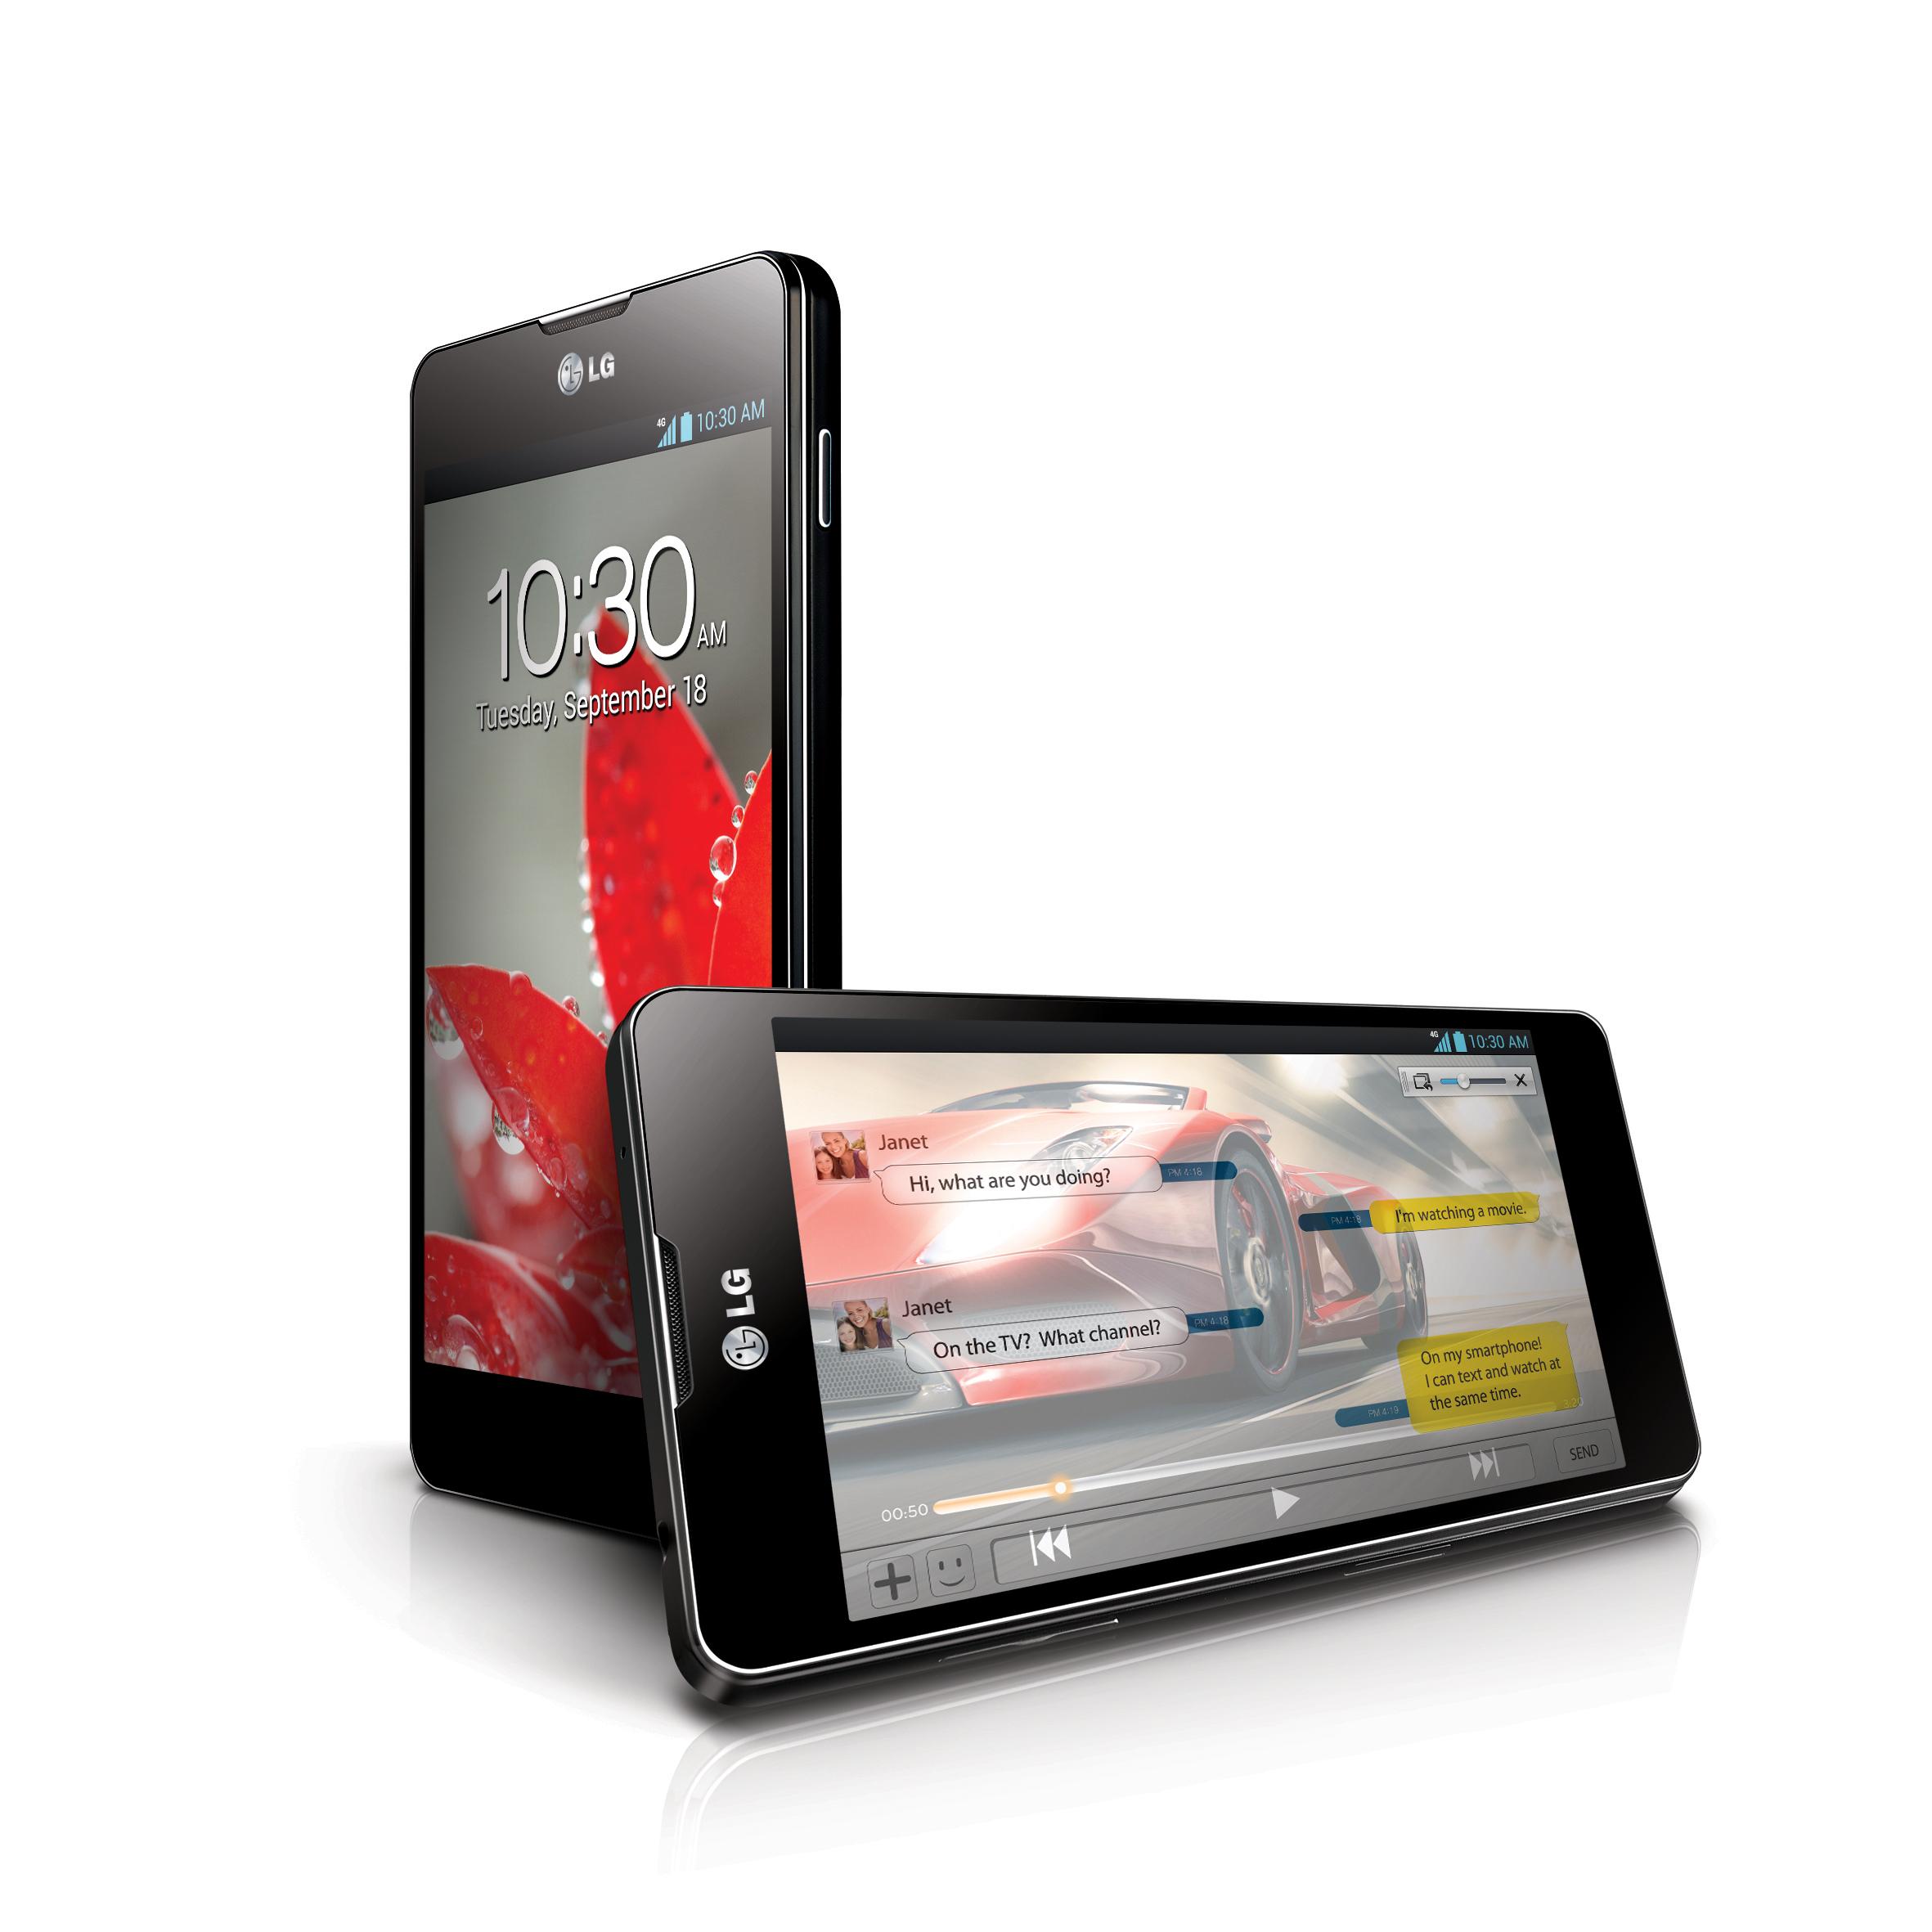 Vertical and horizontal 45-degree views of LG Optimus G